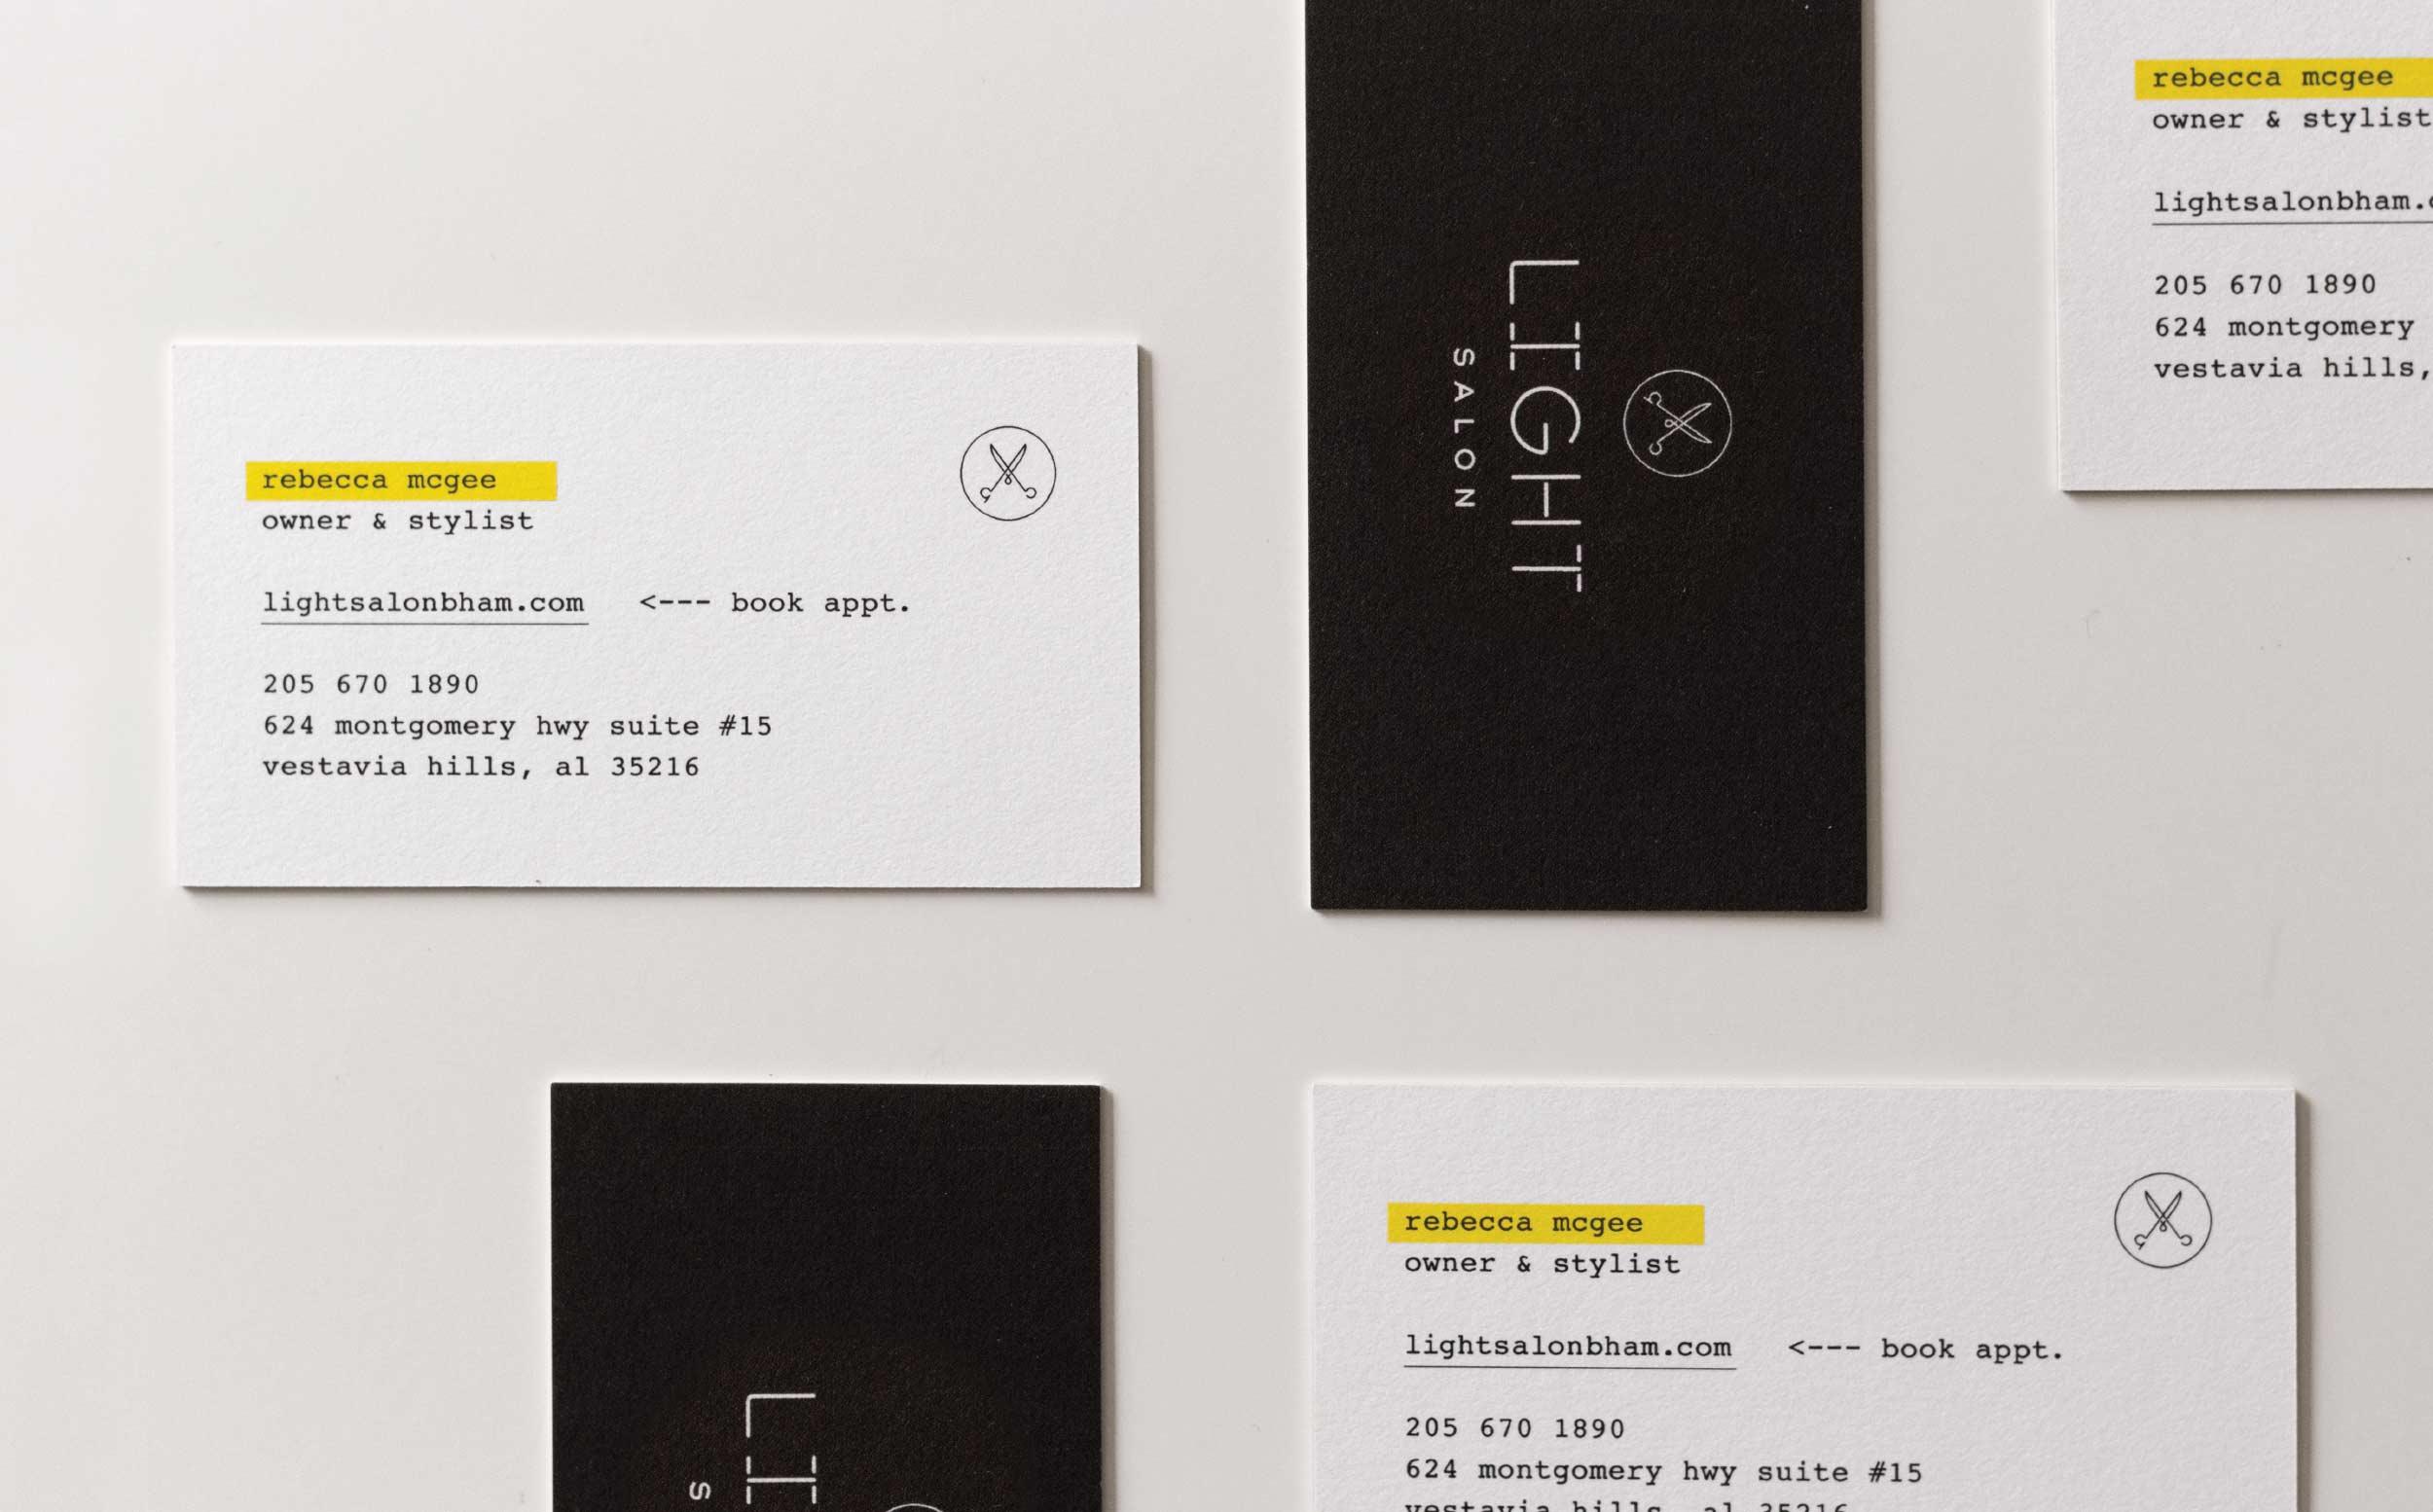 light-businesscards